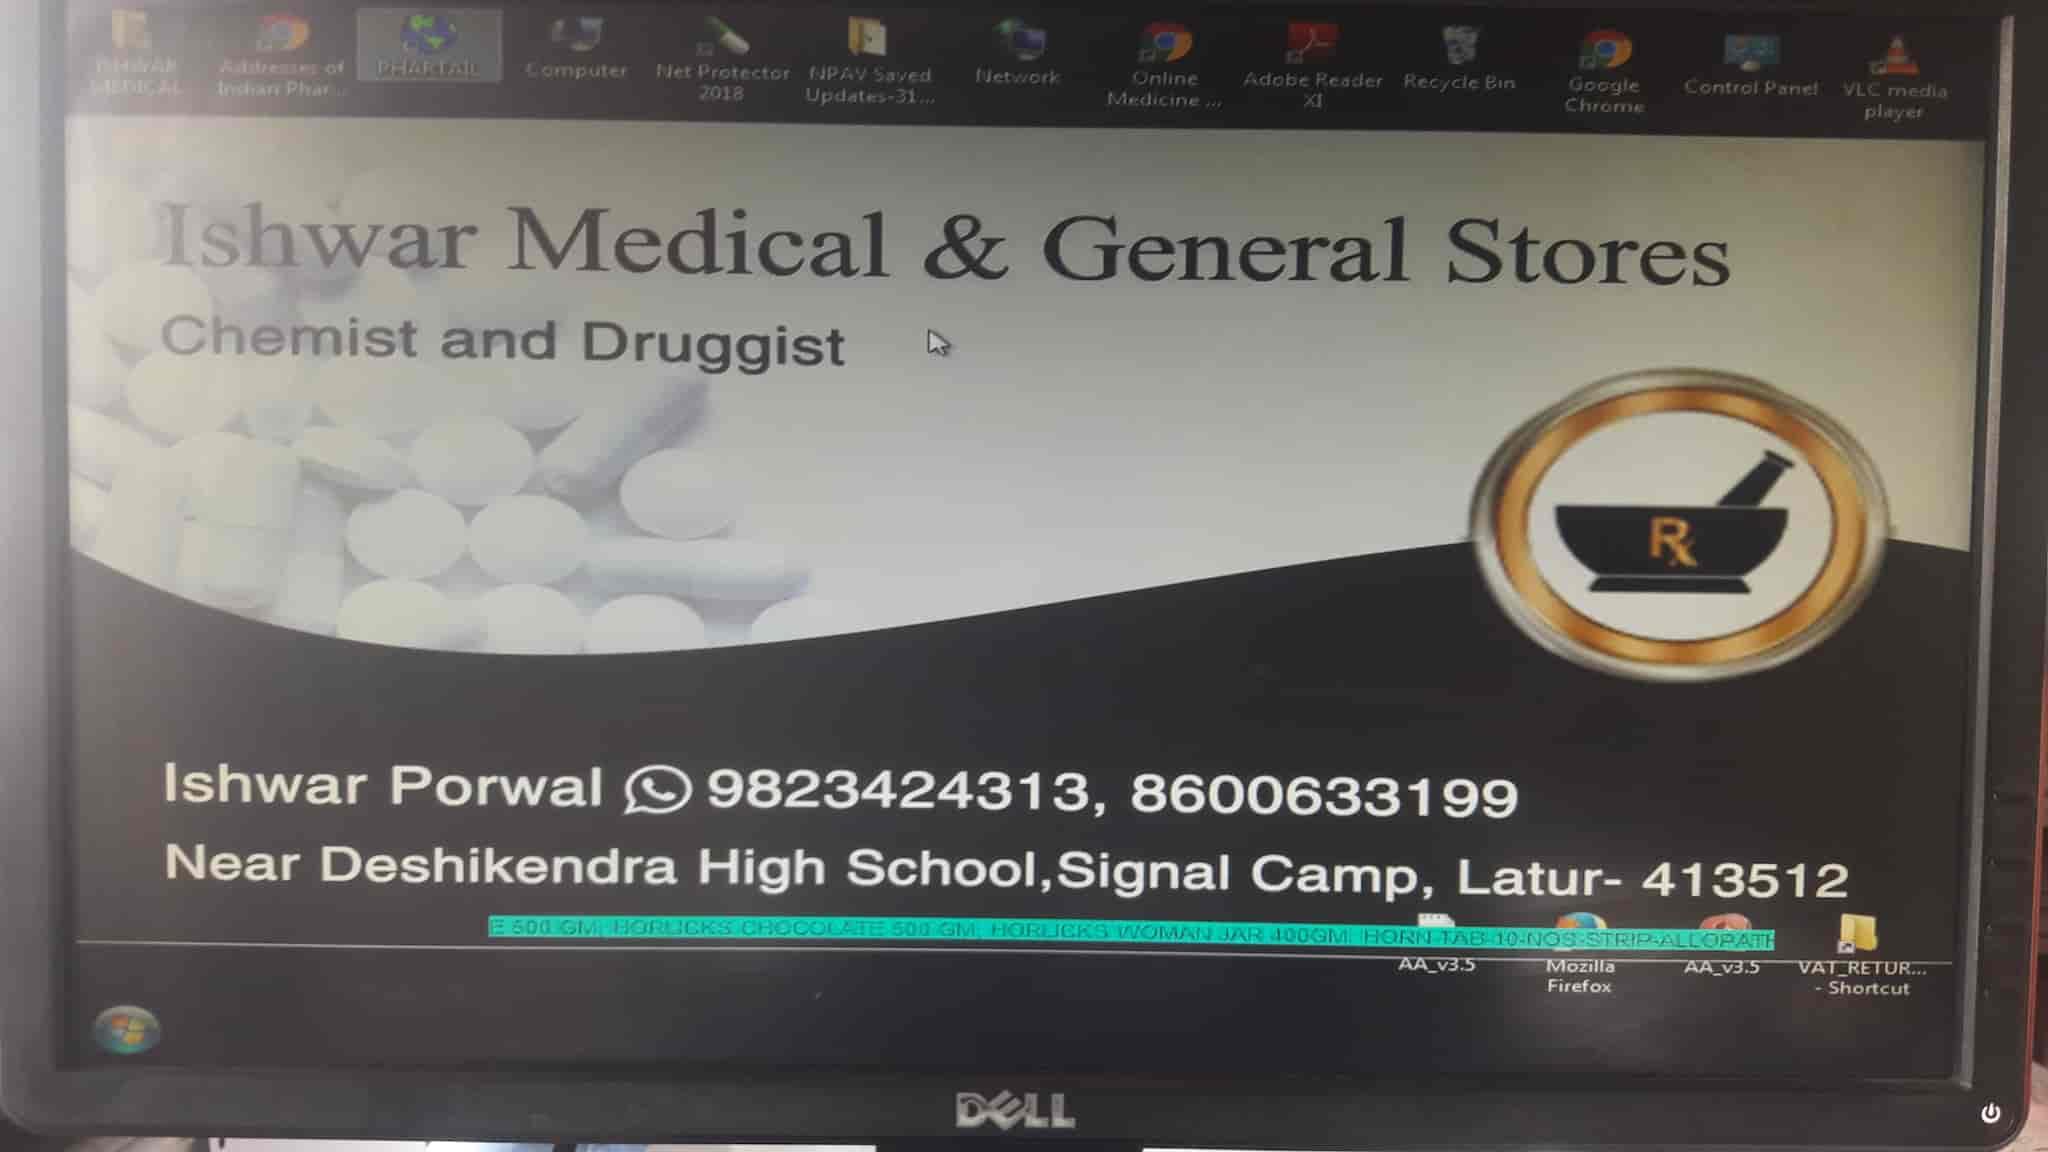 Ishwar Medical General Store Photos, , Latur- Pictures & Images